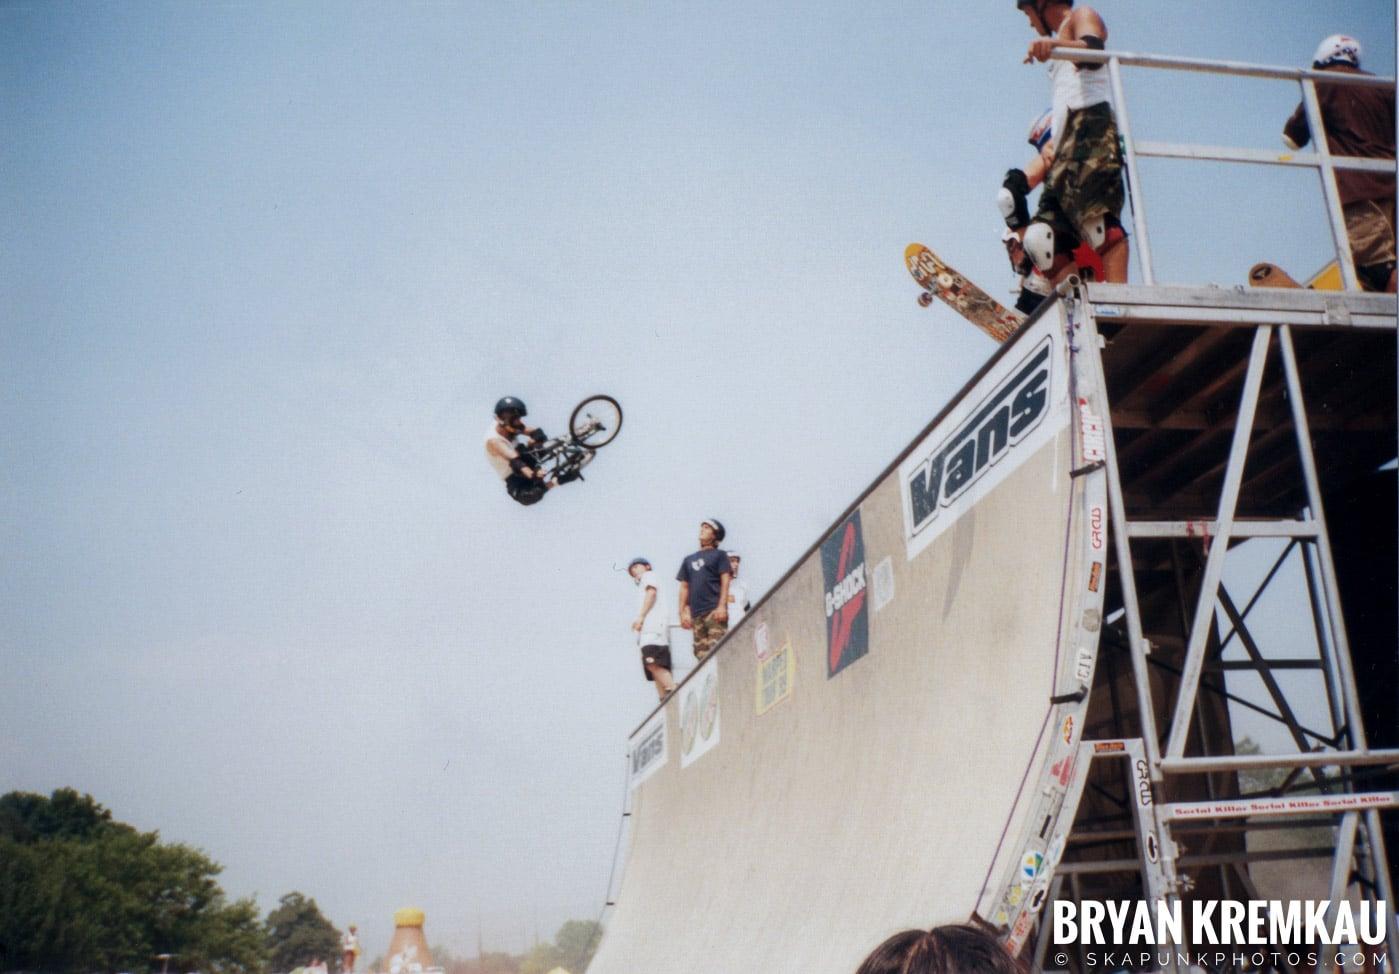 Skaters @ Vans Warped Tour, Randall's Island, NYC - 7.16.99 (8)